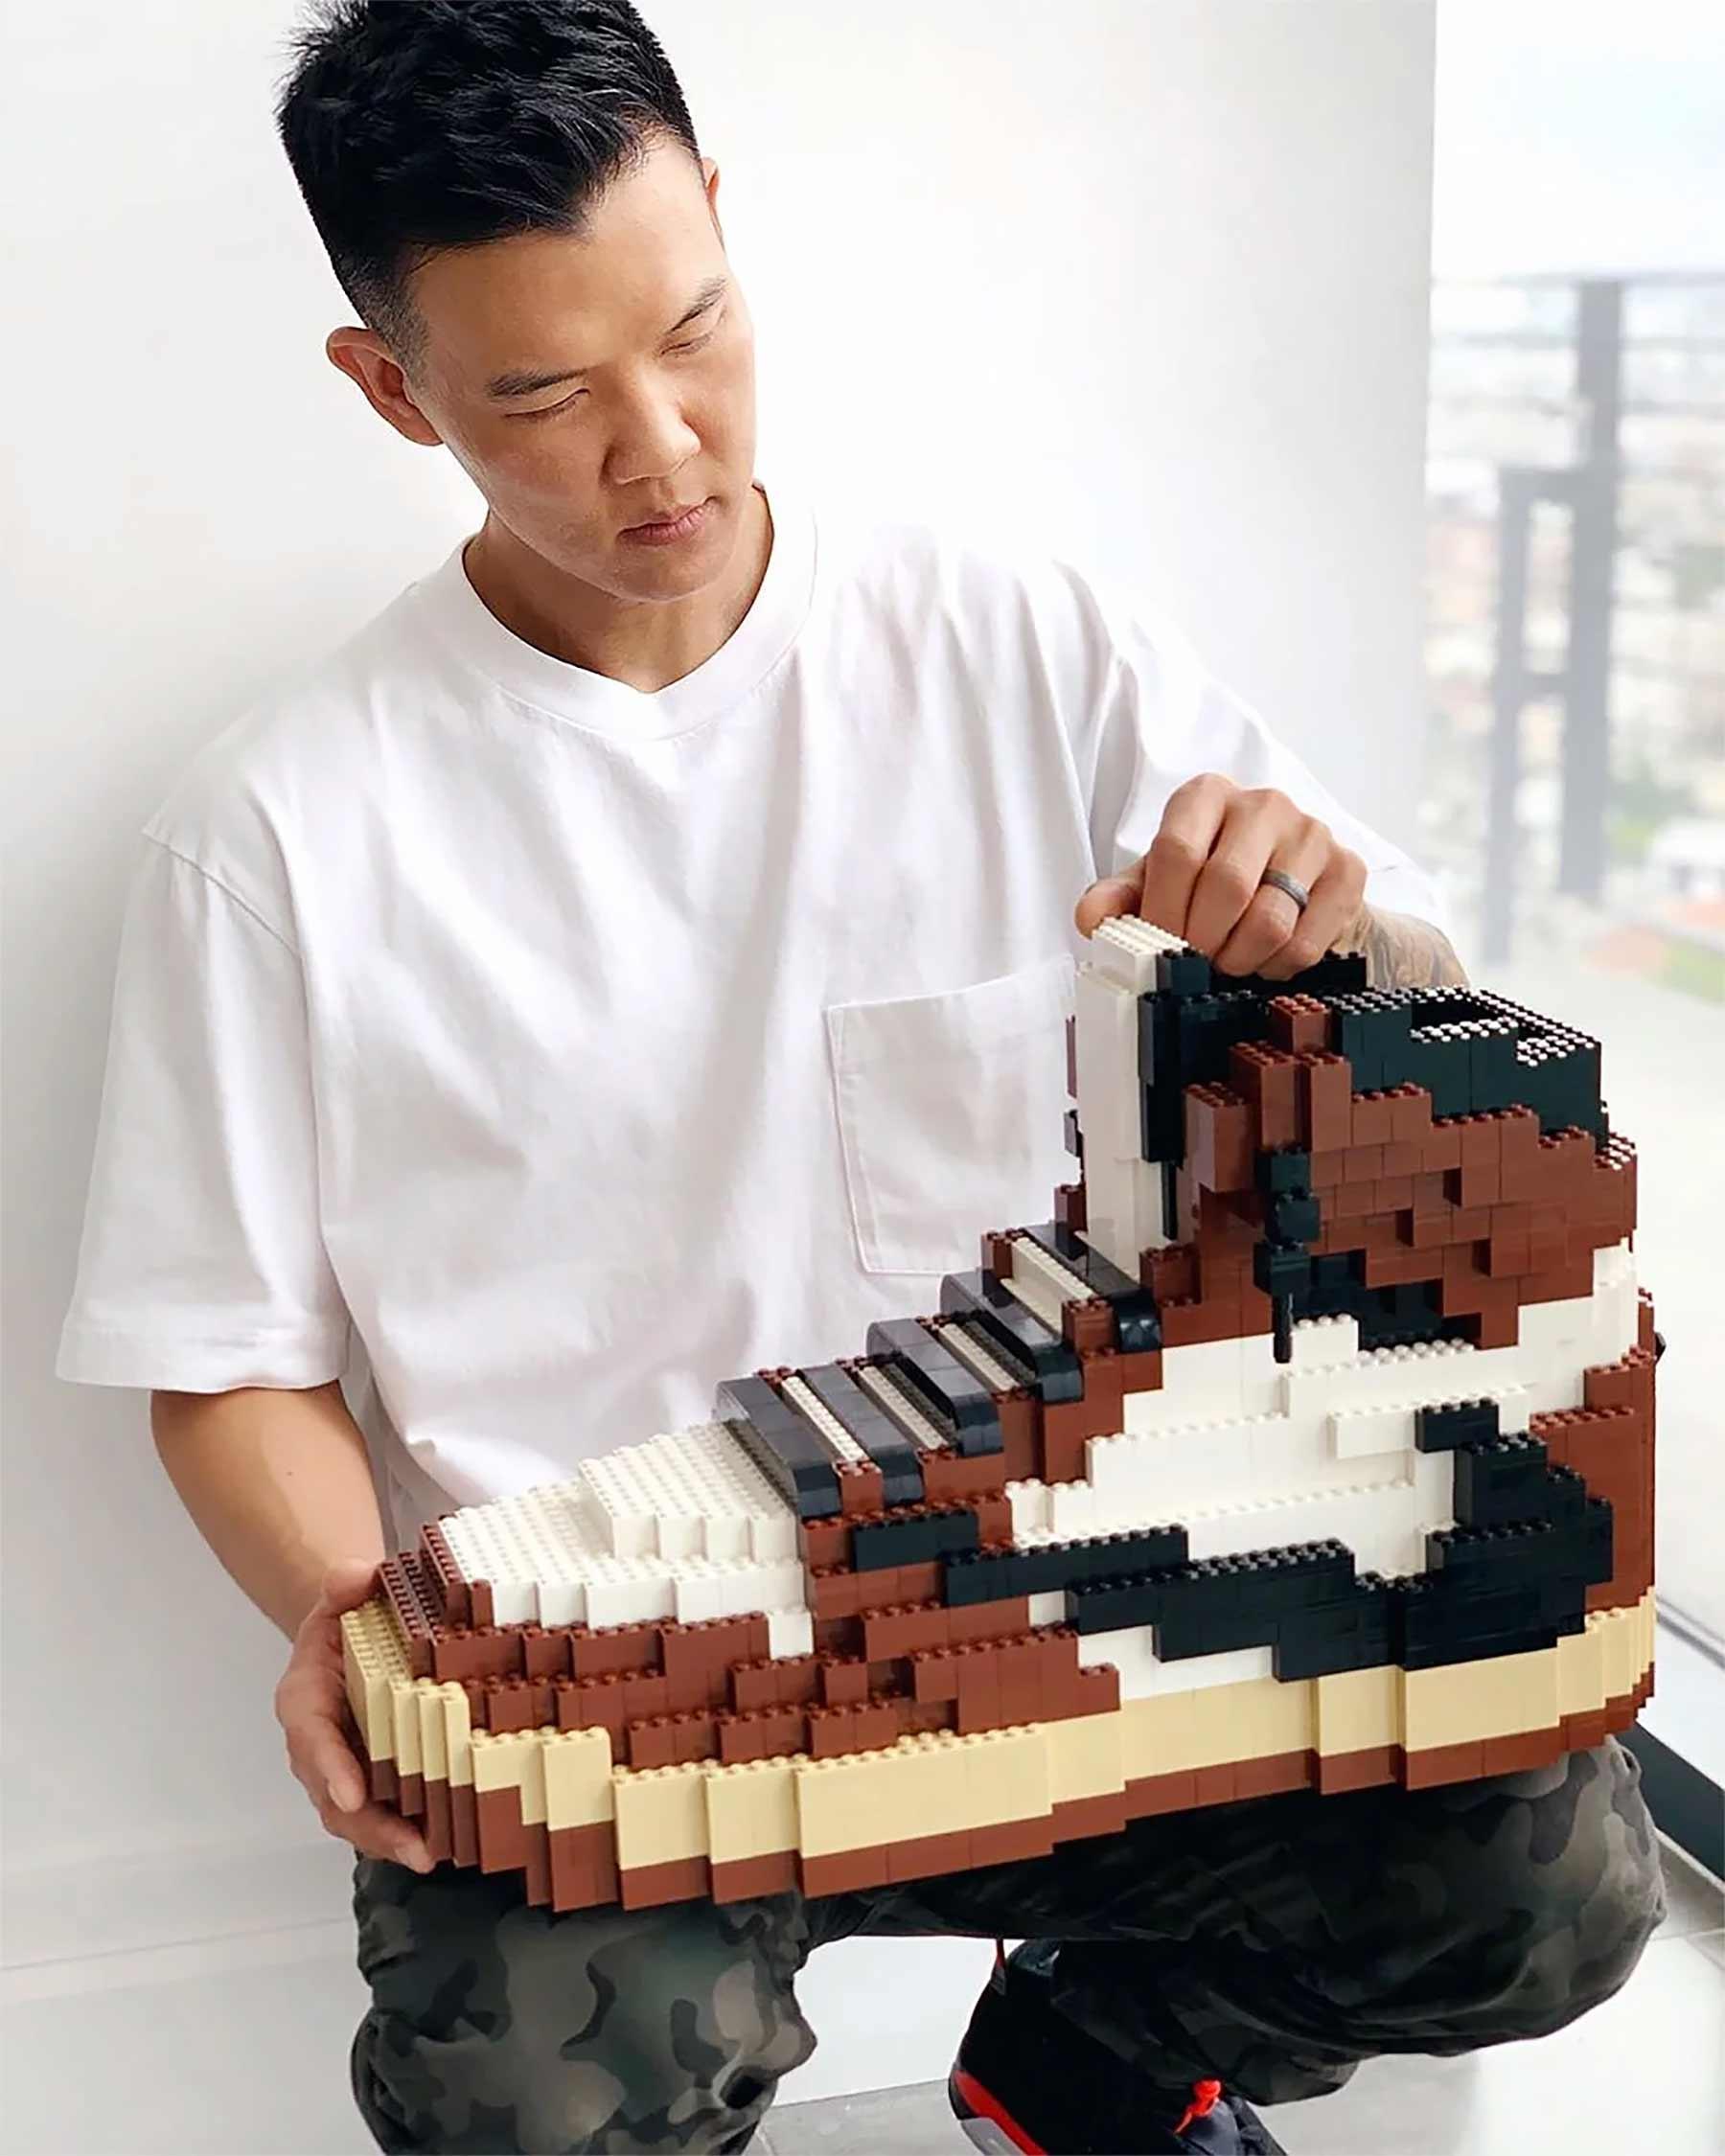 LEGO-Sneaker von Tom Yoo LEGO-Sneaker-Tom-Yoo_08